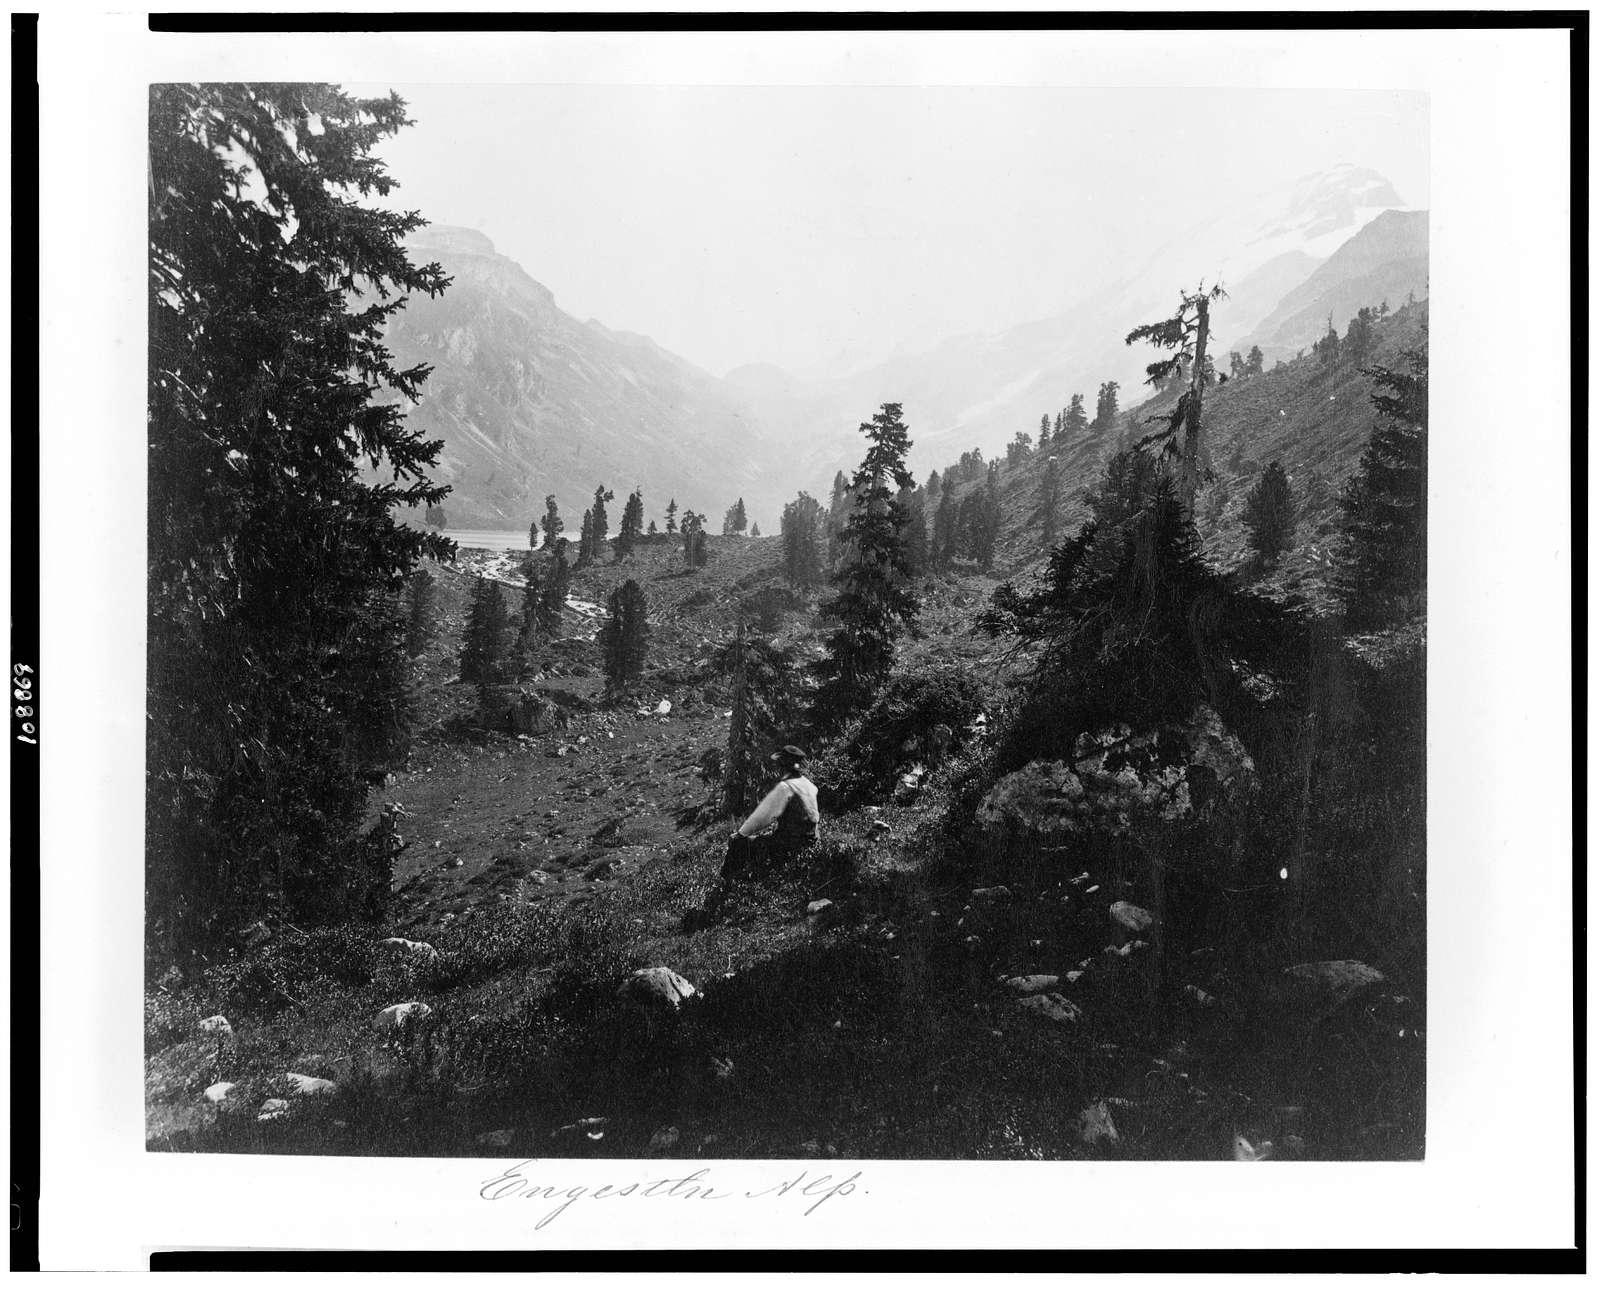 Engestln Alp